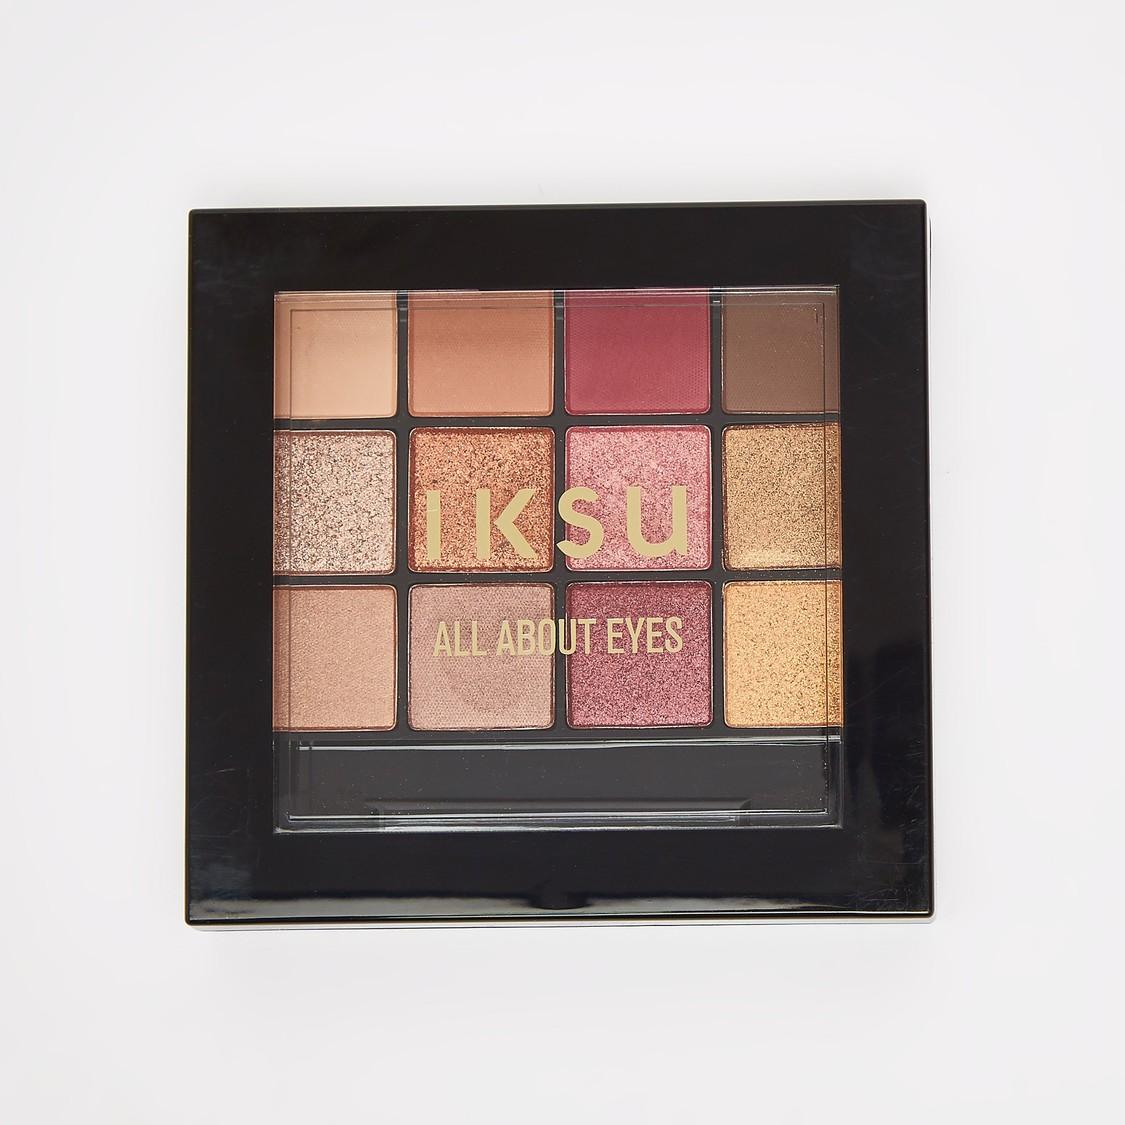 IKSU All About Eyes Make-Up